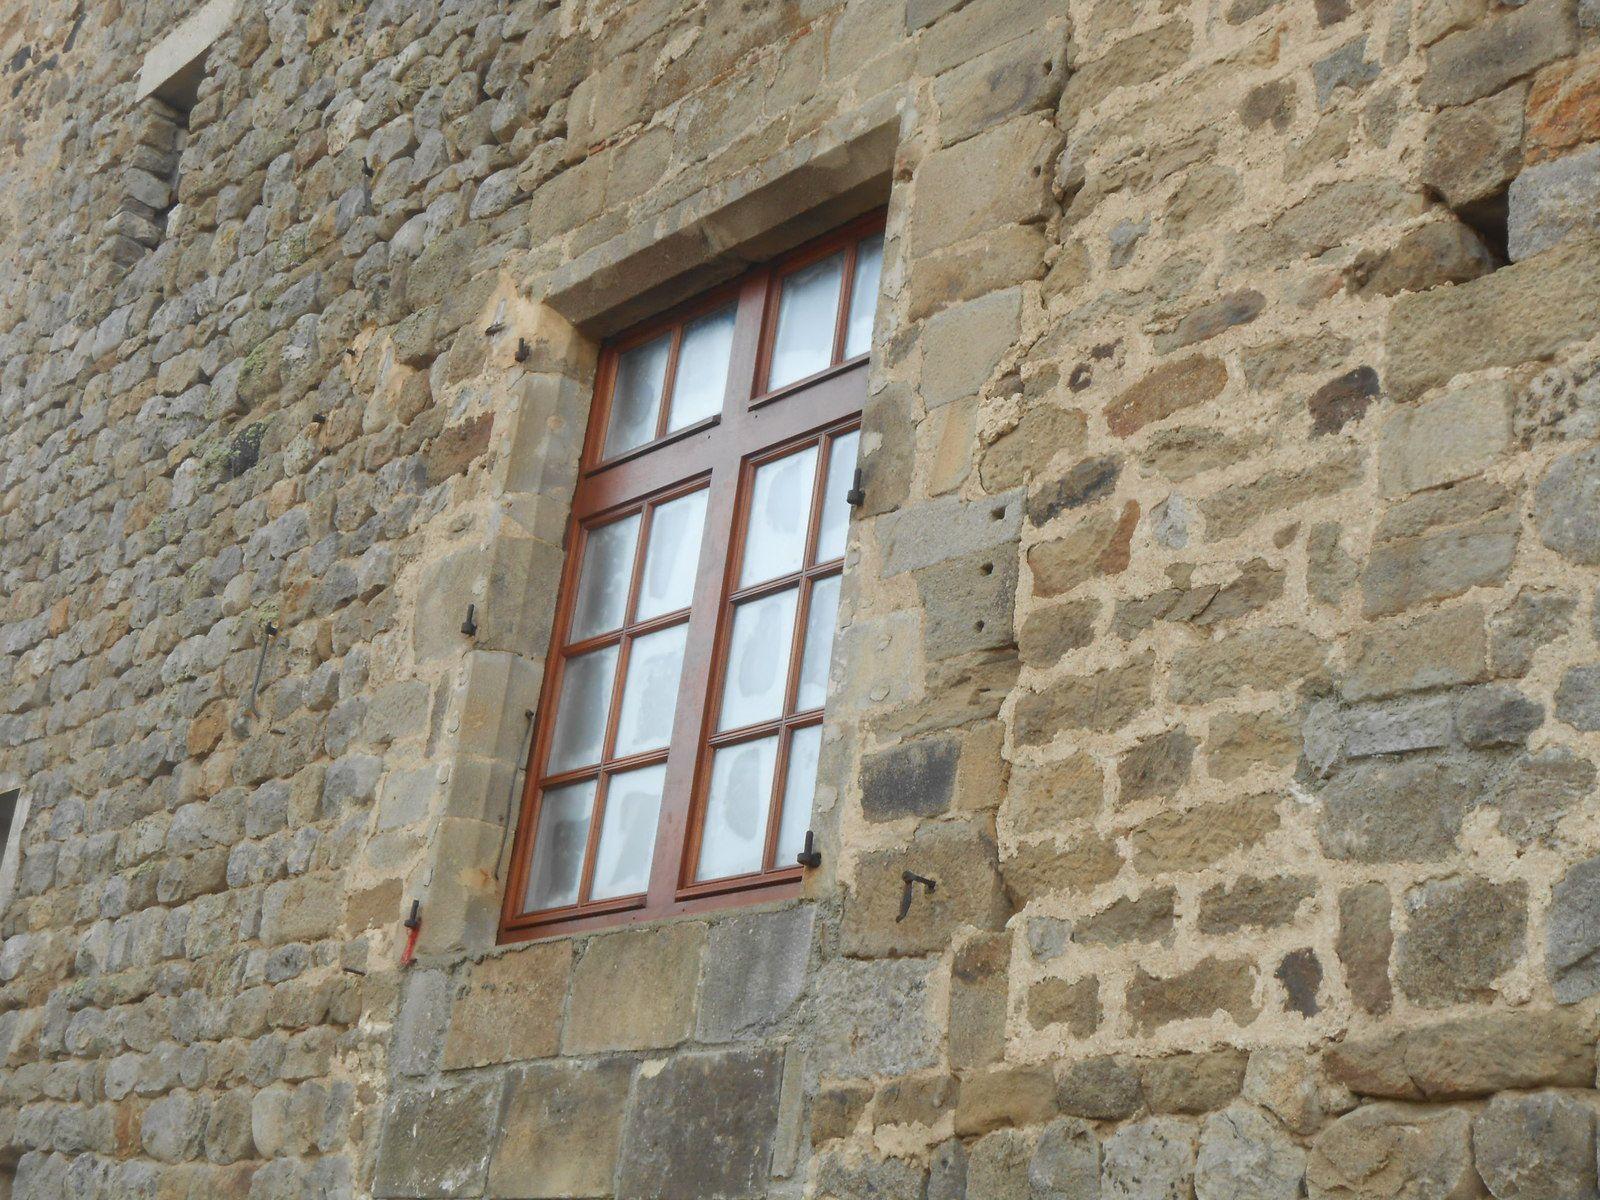 Nouvelles fenêtres façade nord (grande salle)